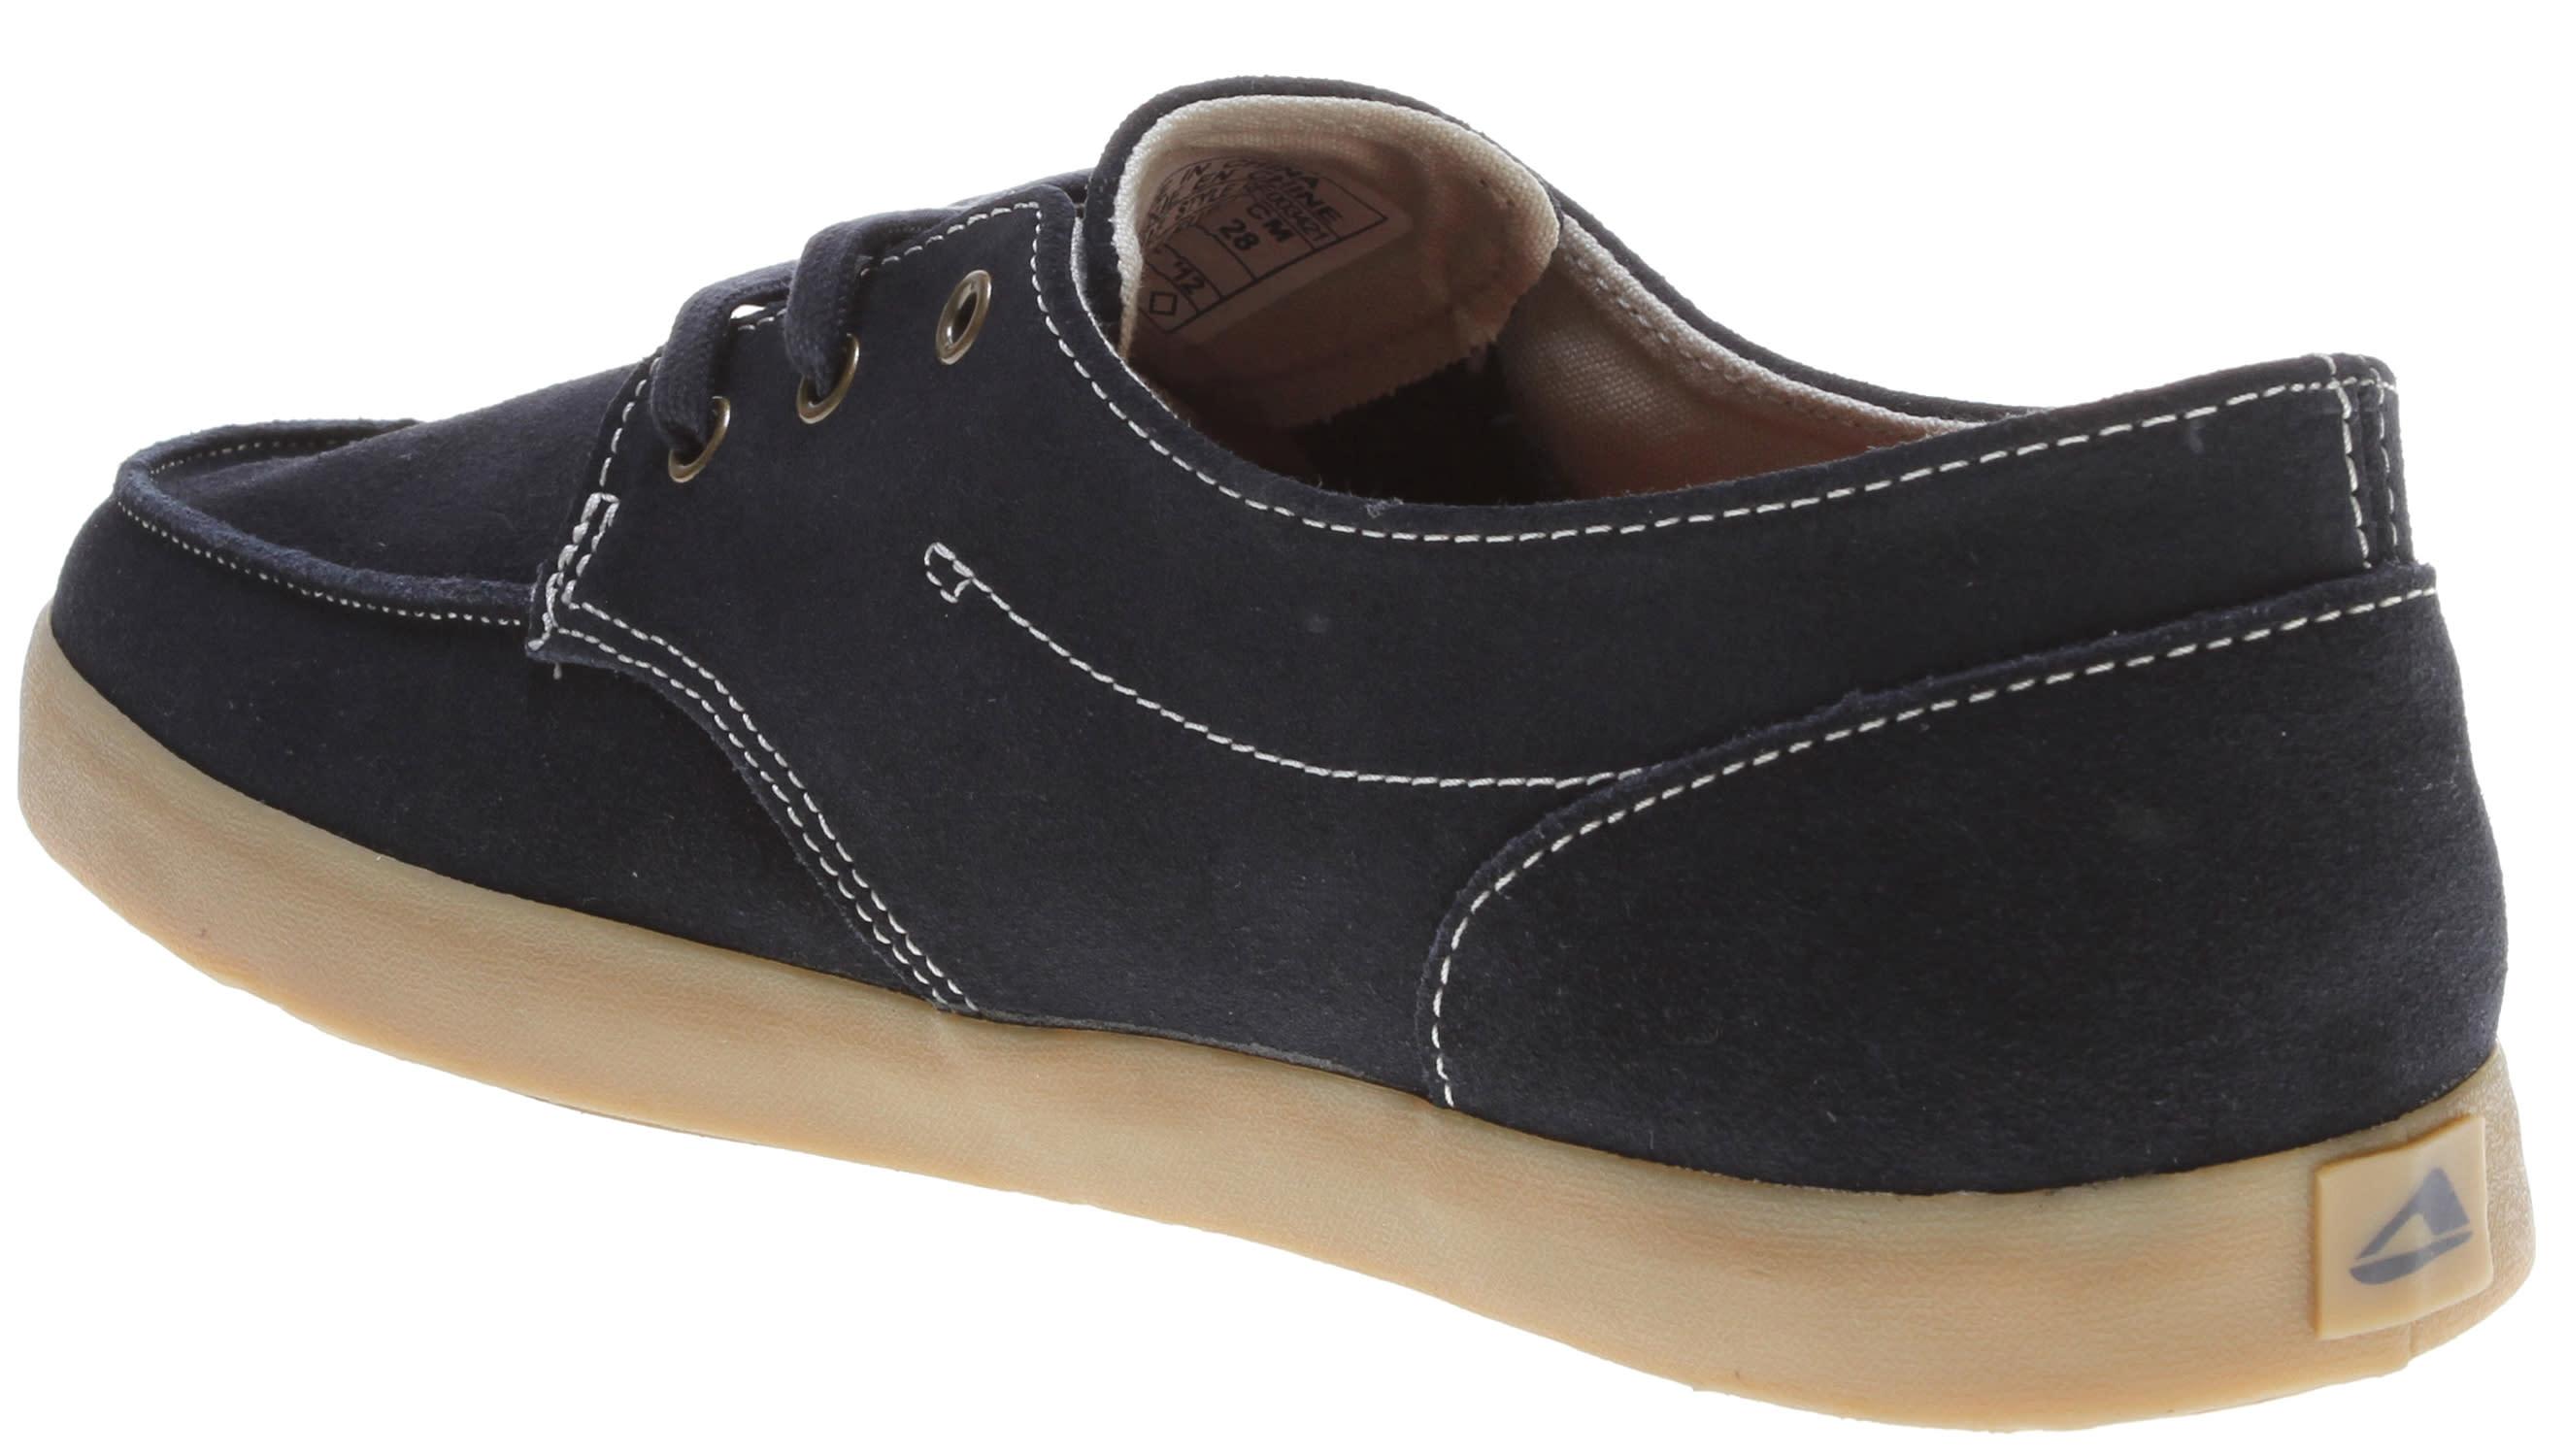 79c9678afd143 Reef Deck Hand 2 LE Shoes - thumbnail 3